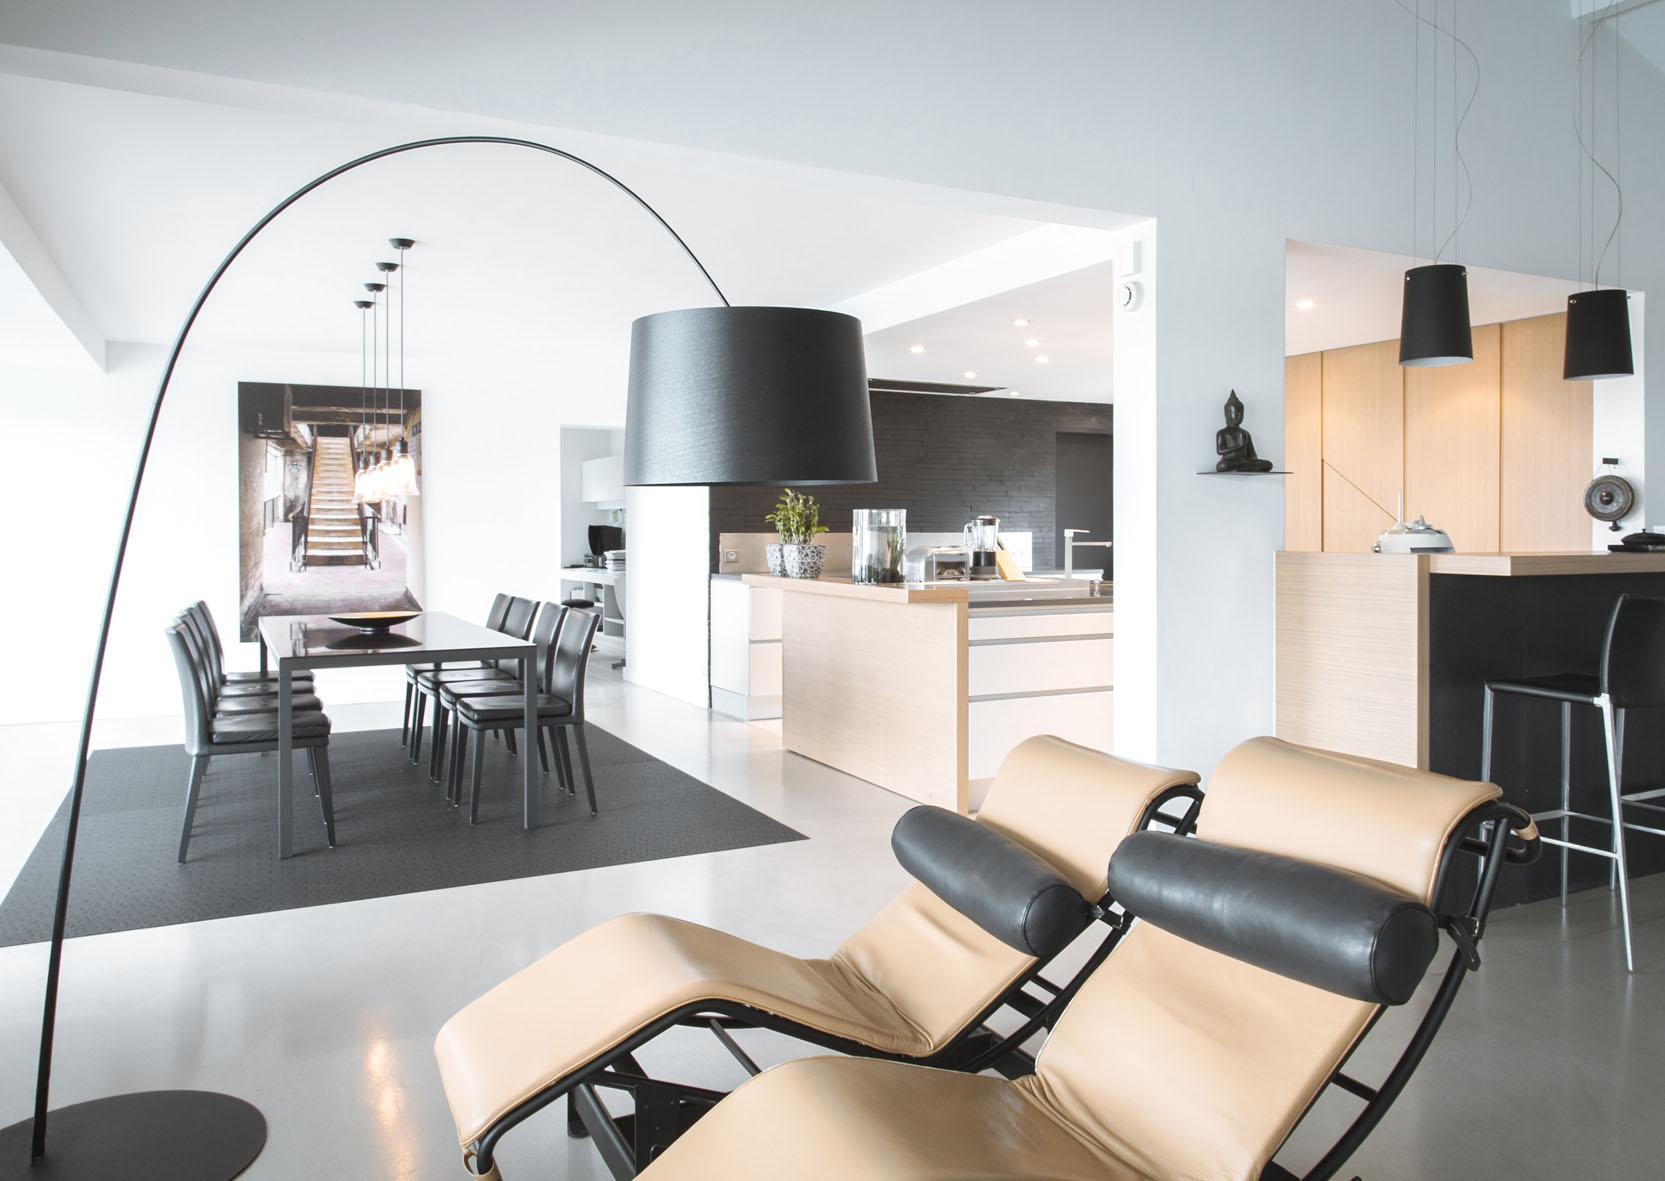 architecte dintrieur biarritz free cuisines architecte dintrieur biarritz esthete conception. Black Bedroom Furniture Sets. Home Design Ideas